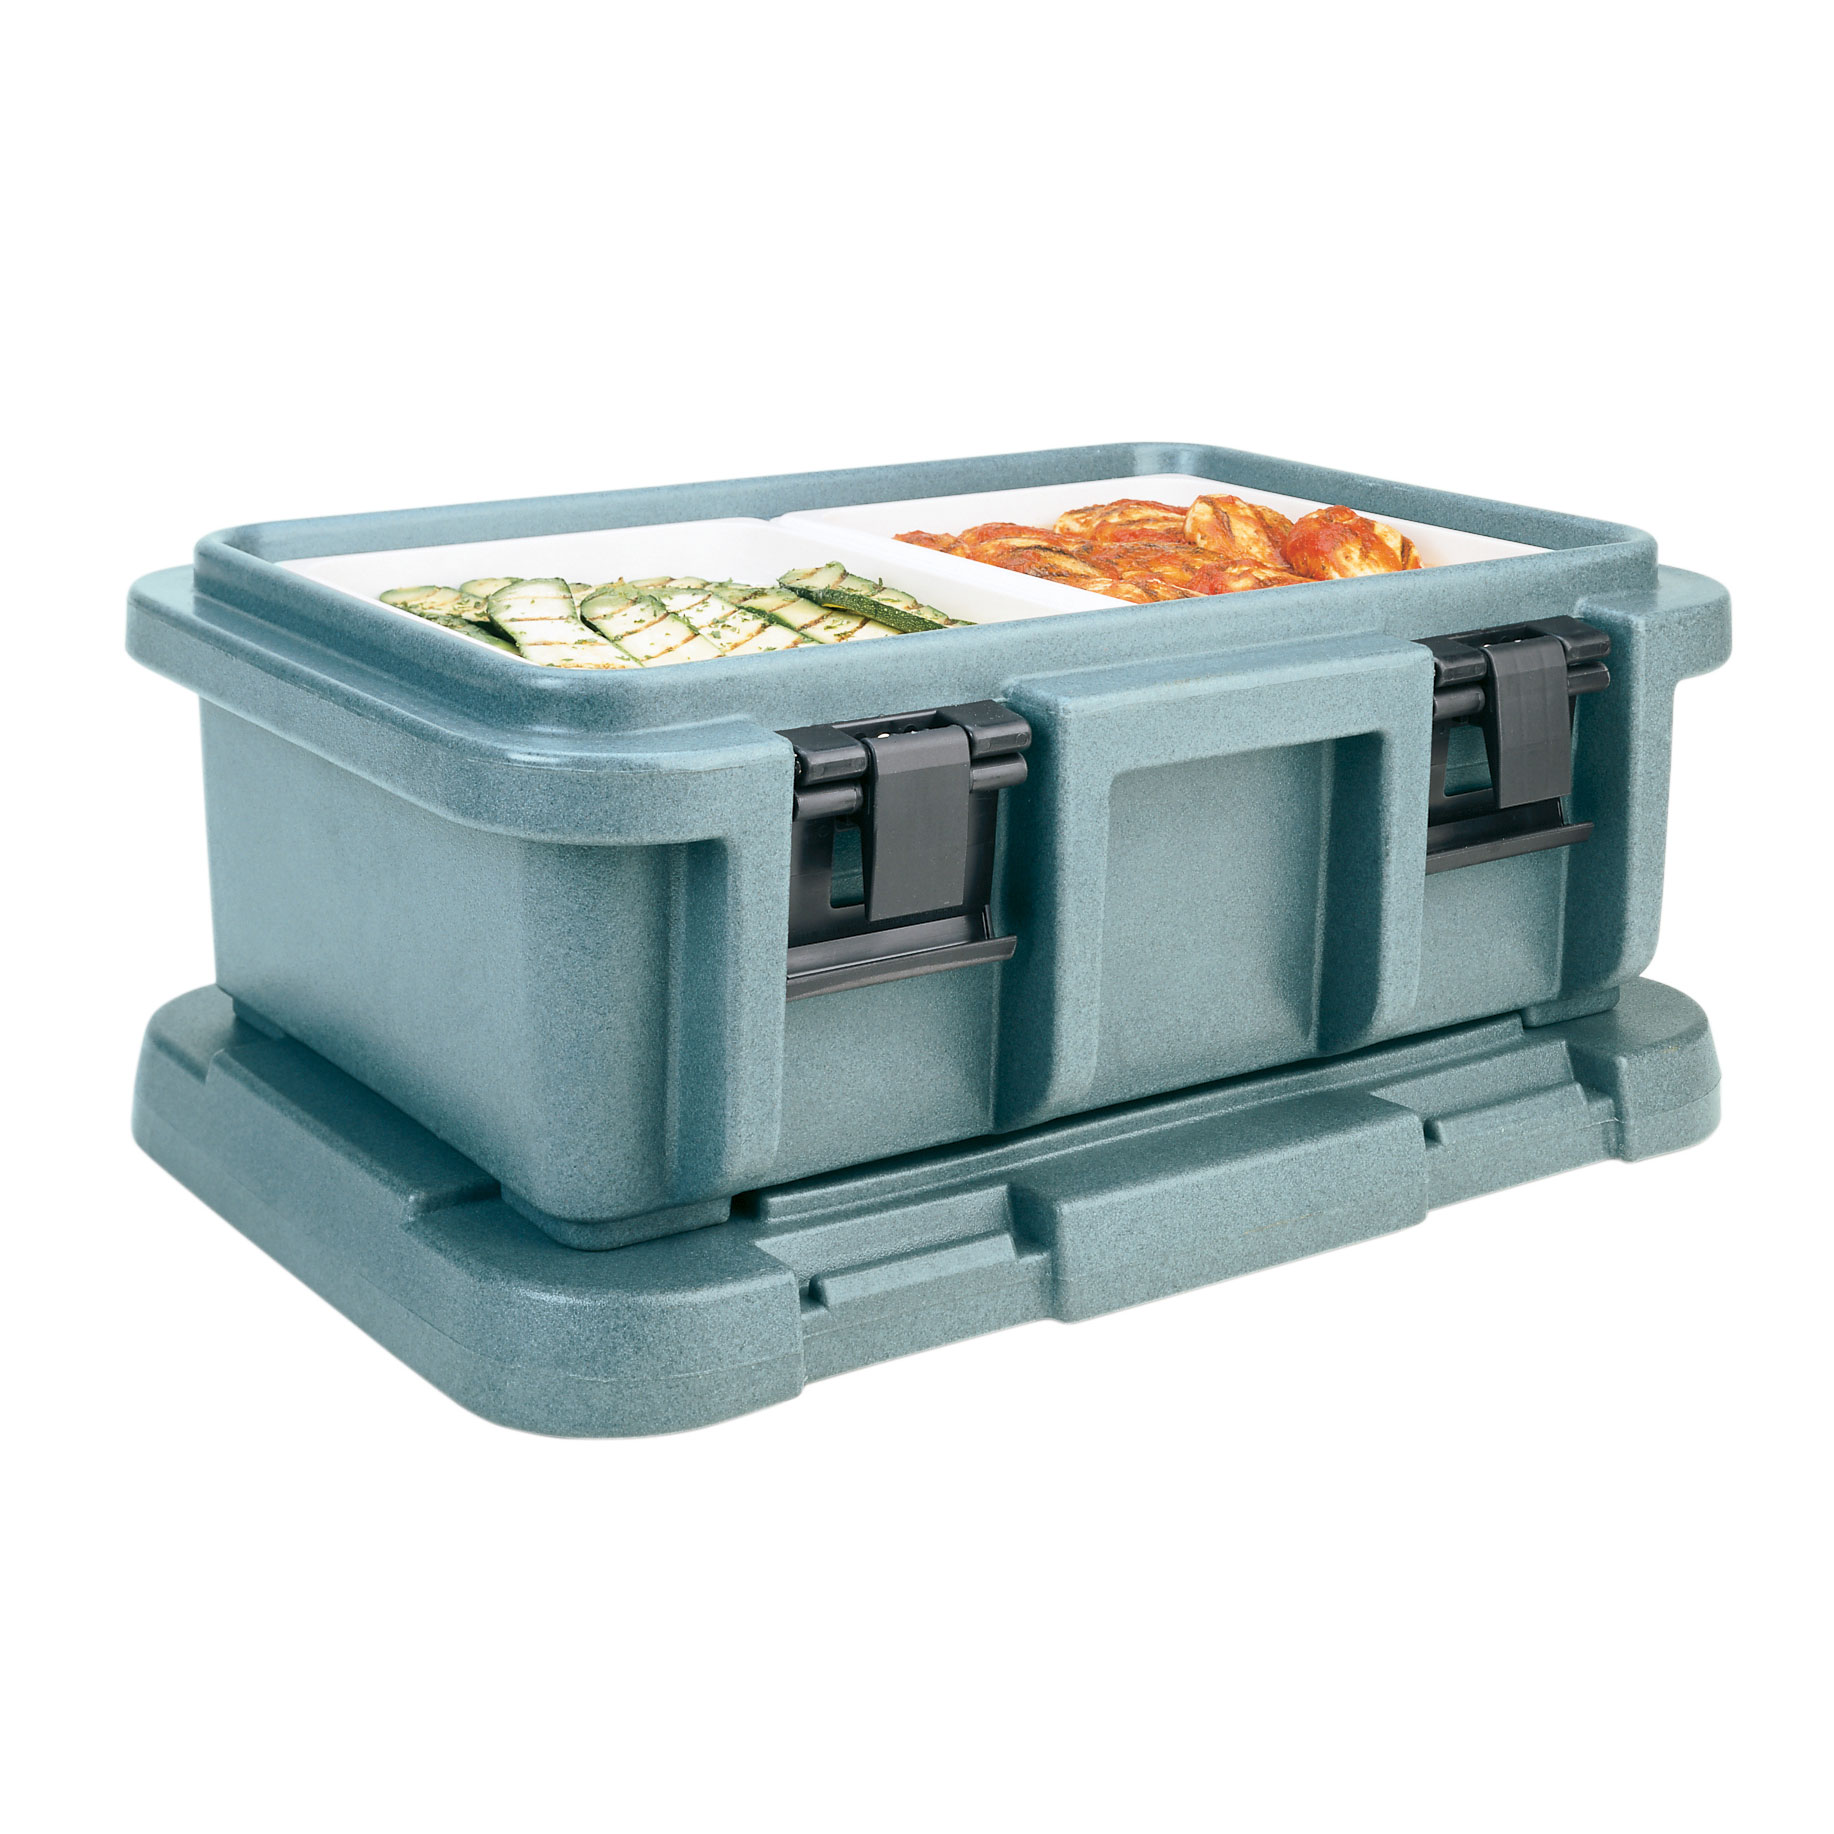 Cambro UPC160401 food pan carriers